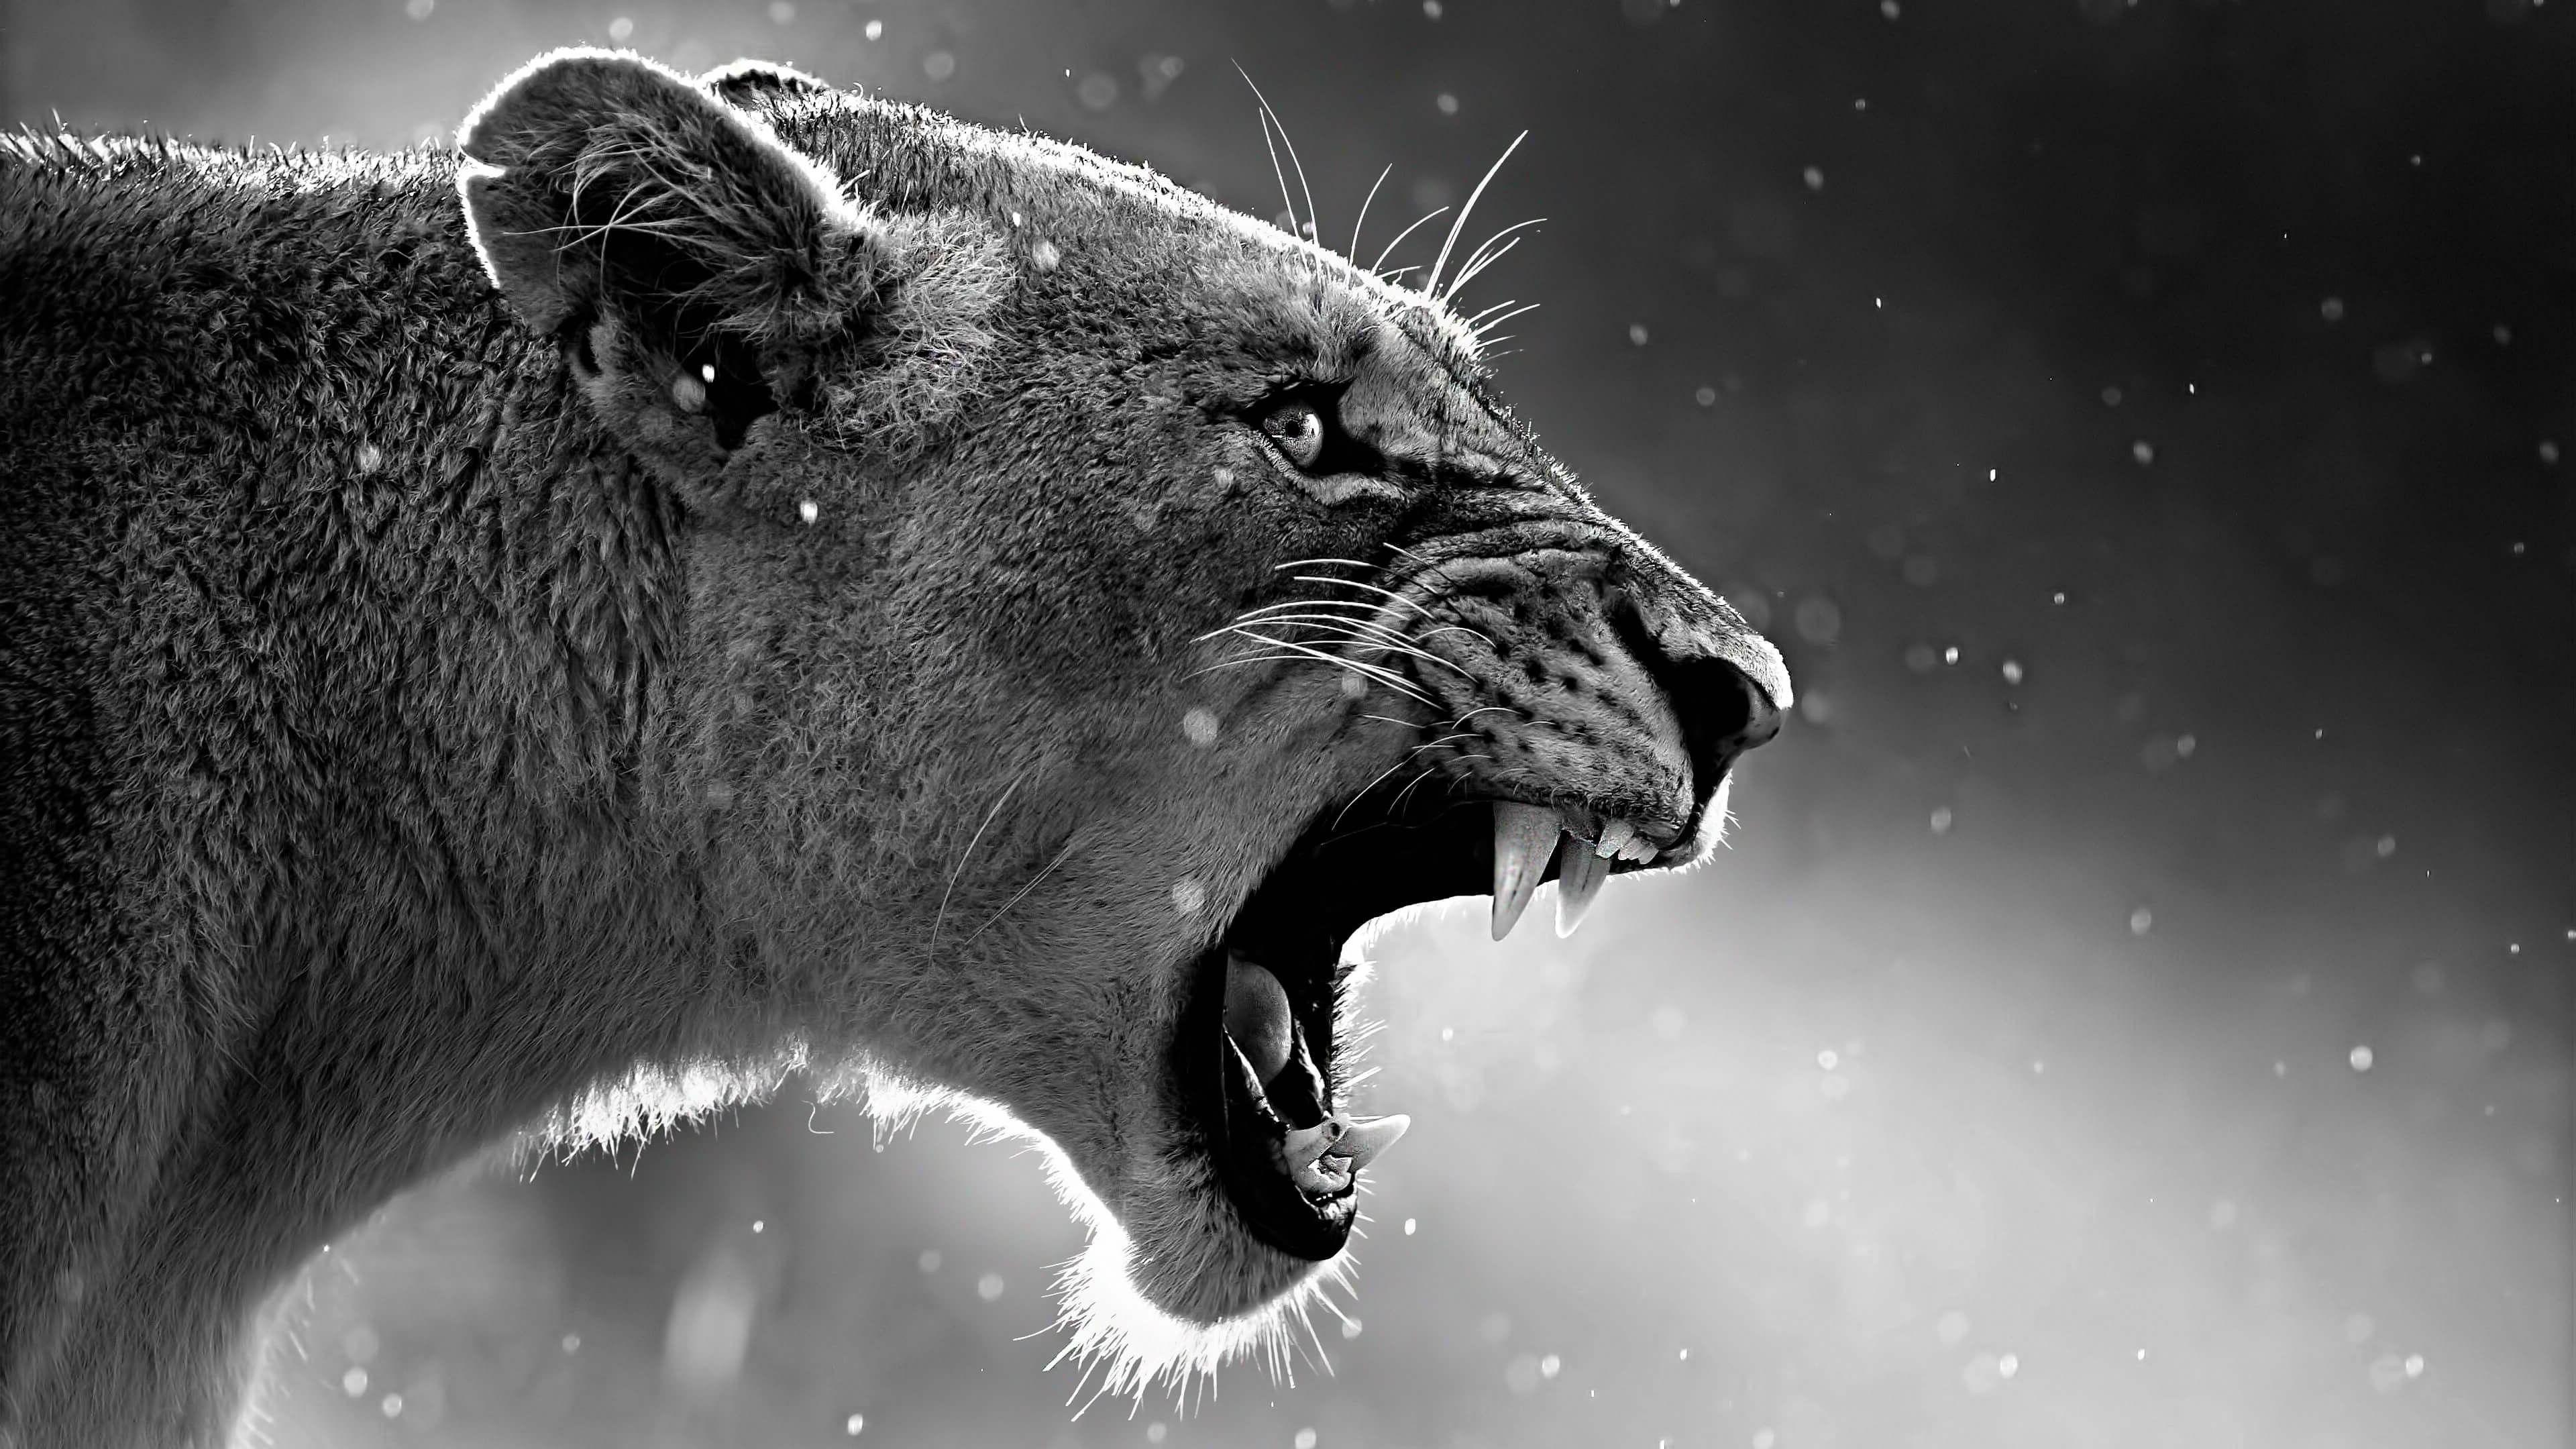 3840x2160 Lion 4k Wallpaper Pc Desktop Animals What Animal Are You Animal Wallpaper